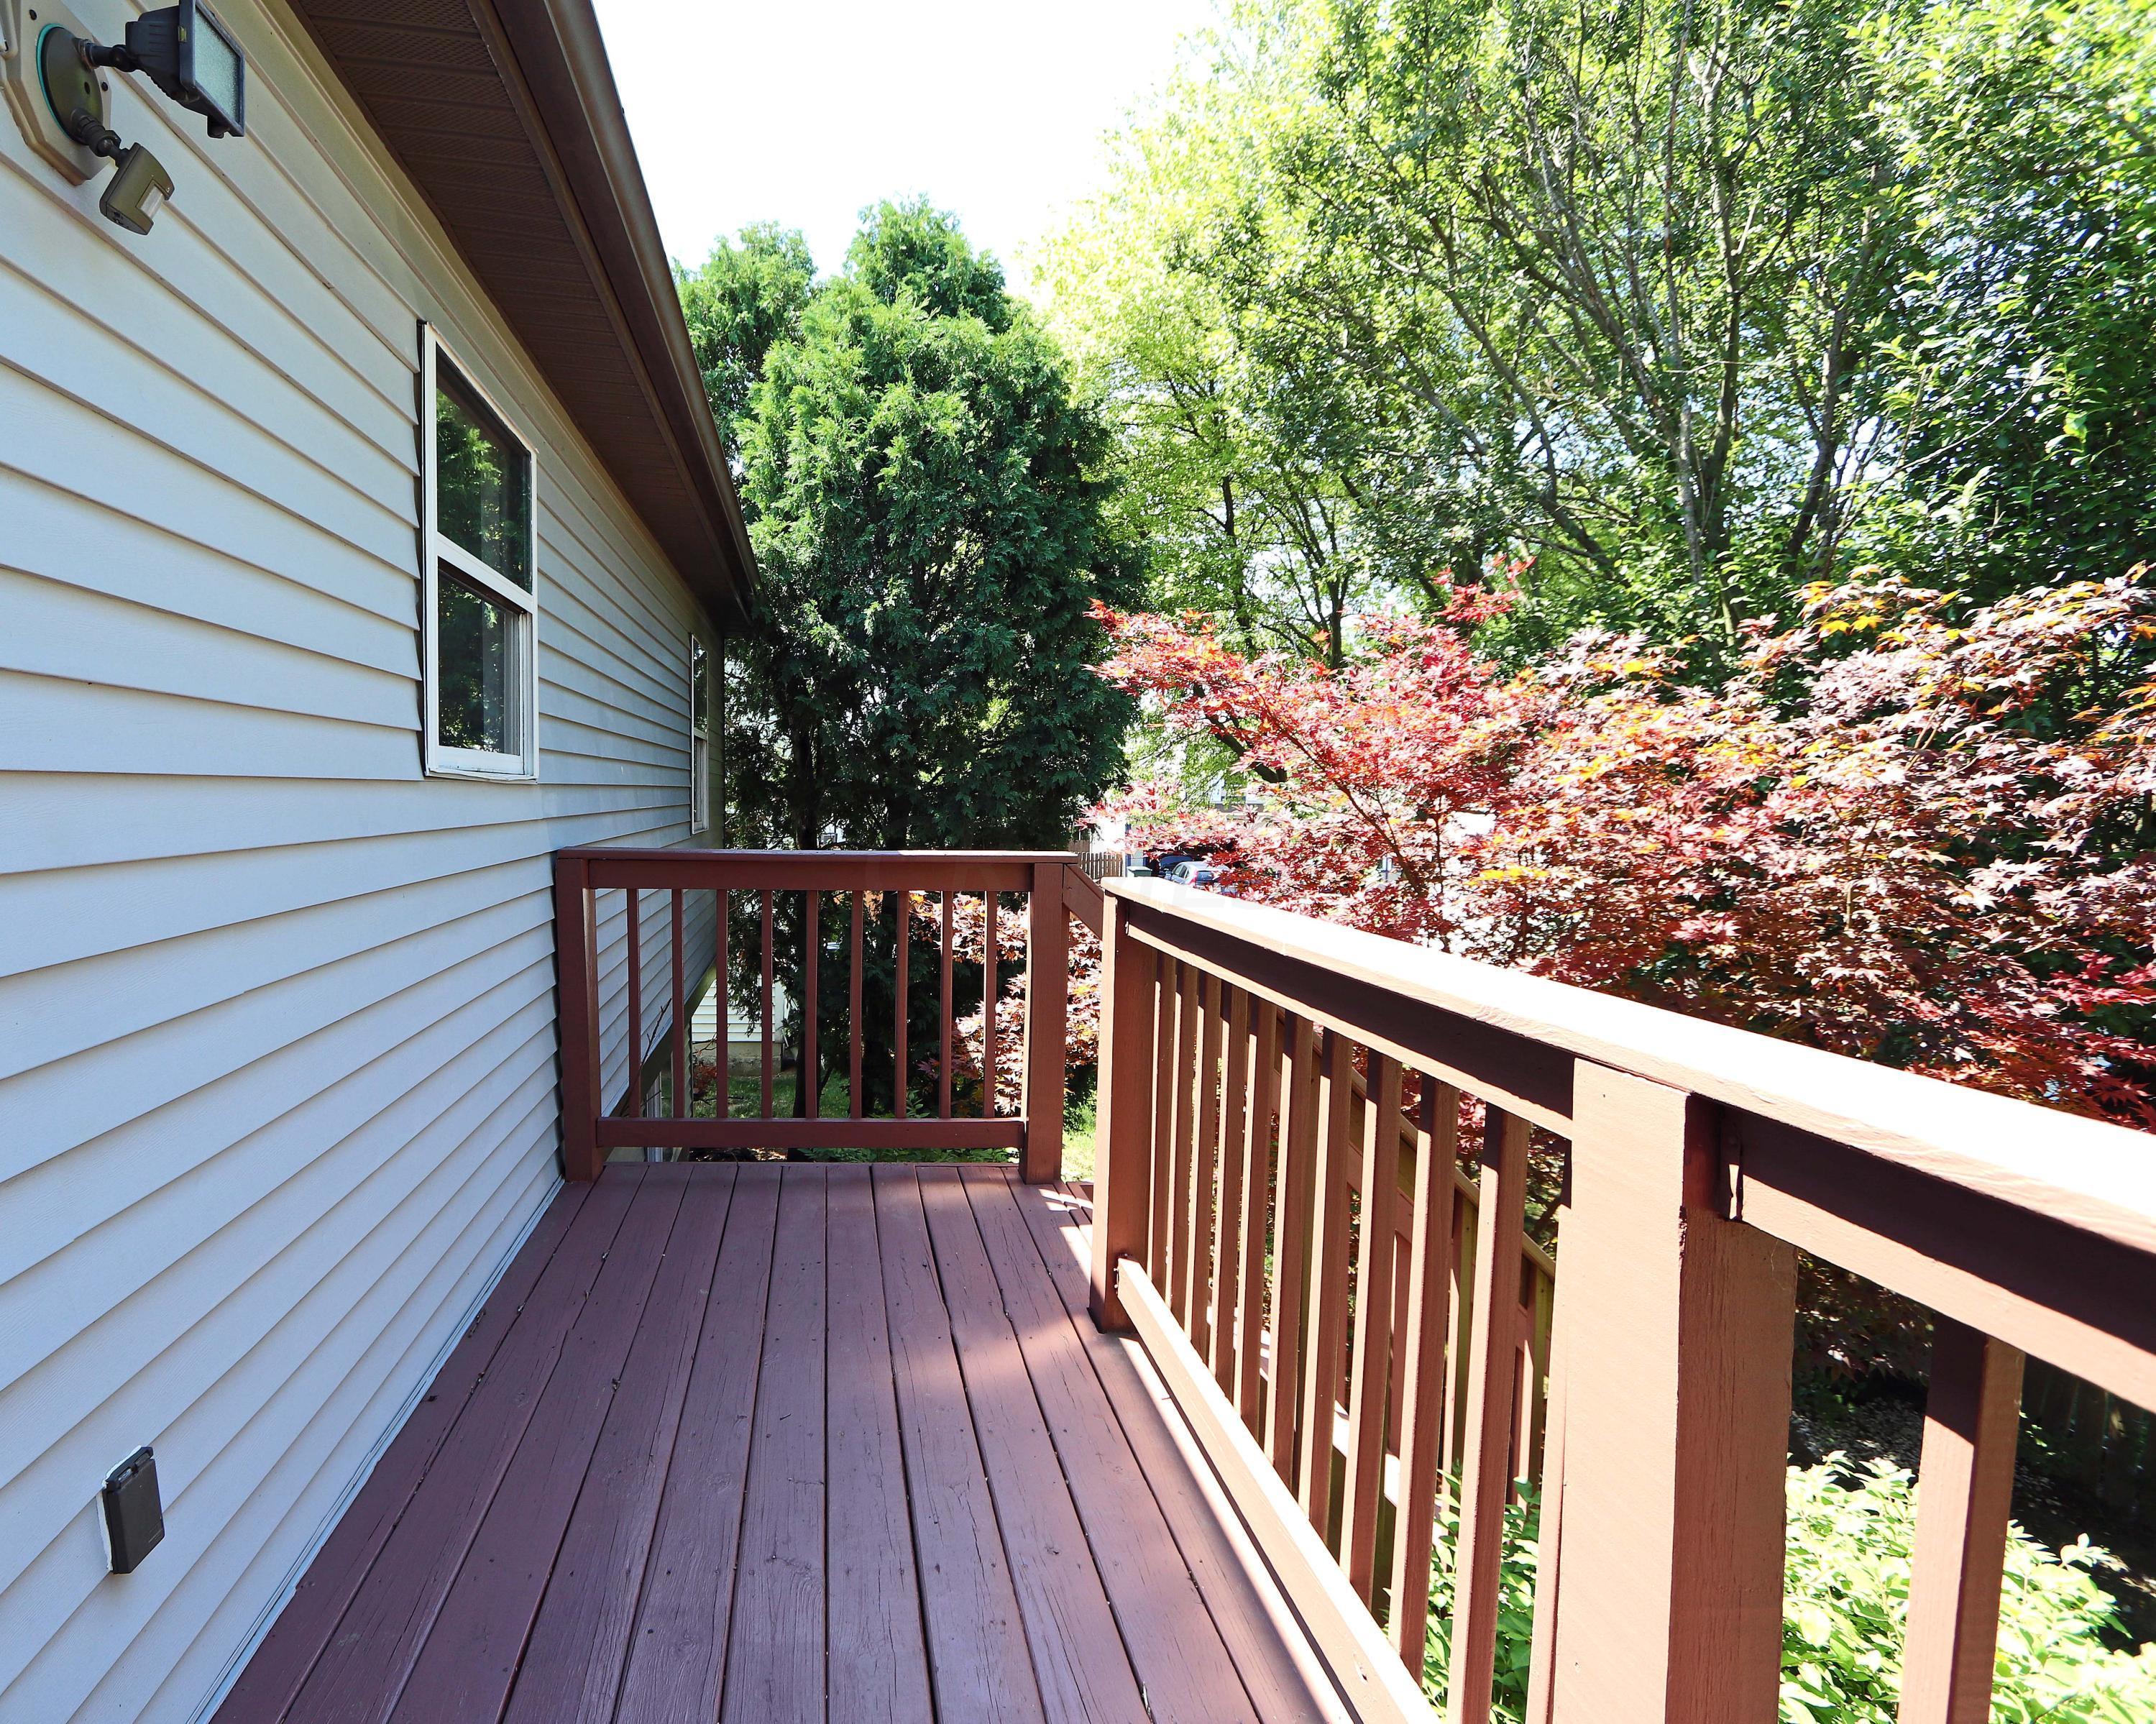 7675 Garrison Drive, Worthington, Ohio 43085, 3 Bedrooms Bedrooms, ,2 BathroomsBathrooms,Residential,For Sale,Garrison,220025498